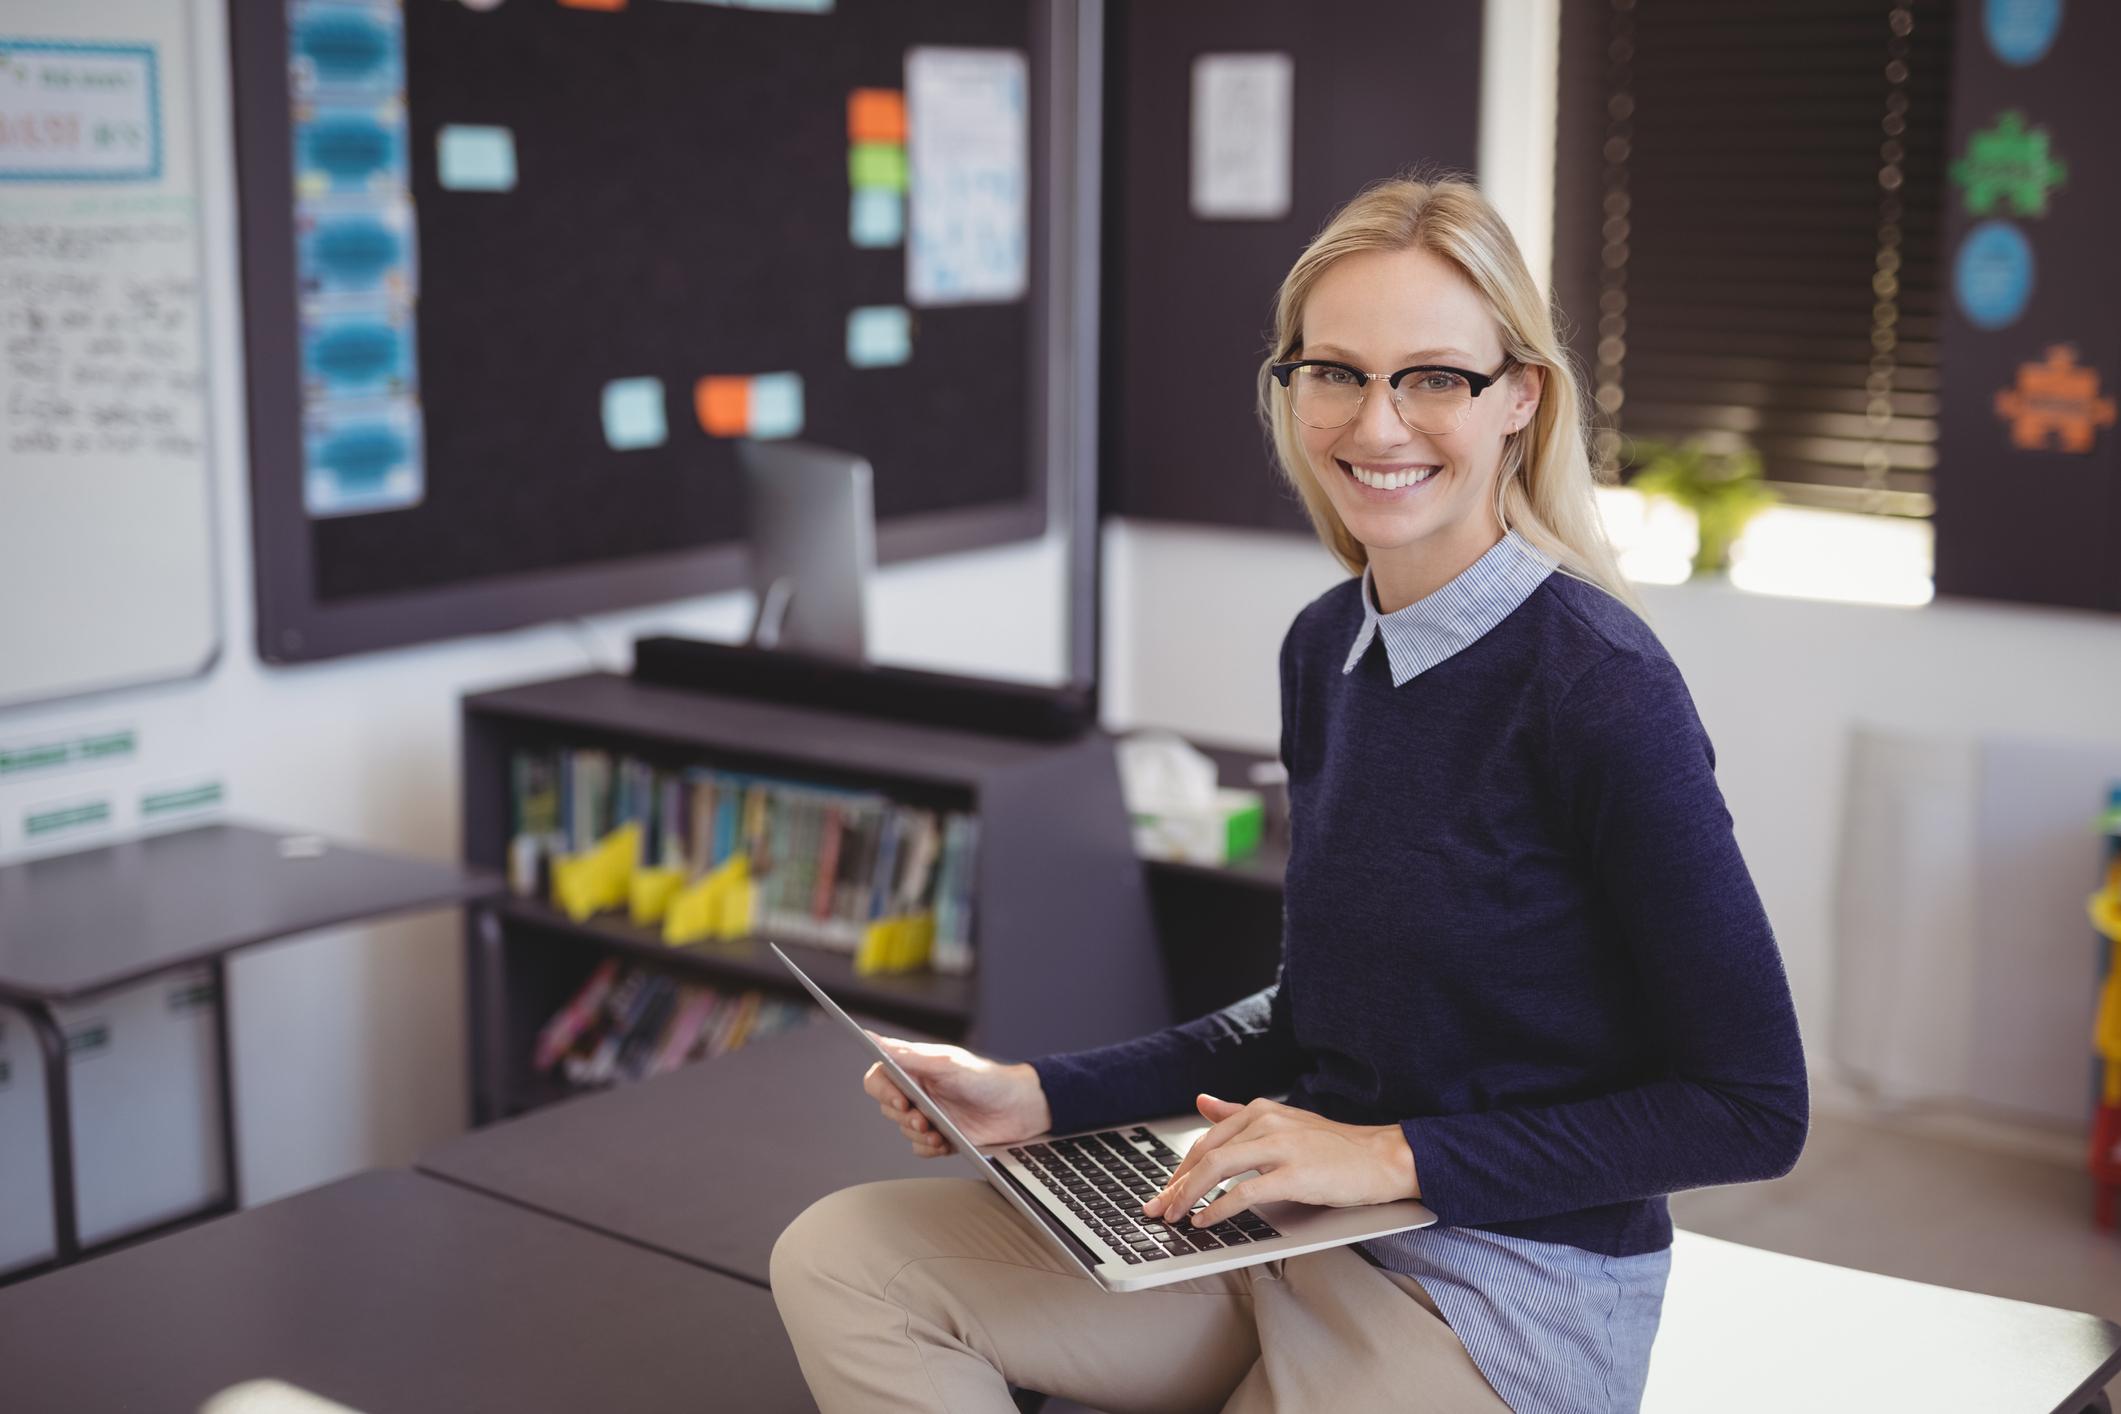 Portrait of happy teacher using laptop in classroom at school